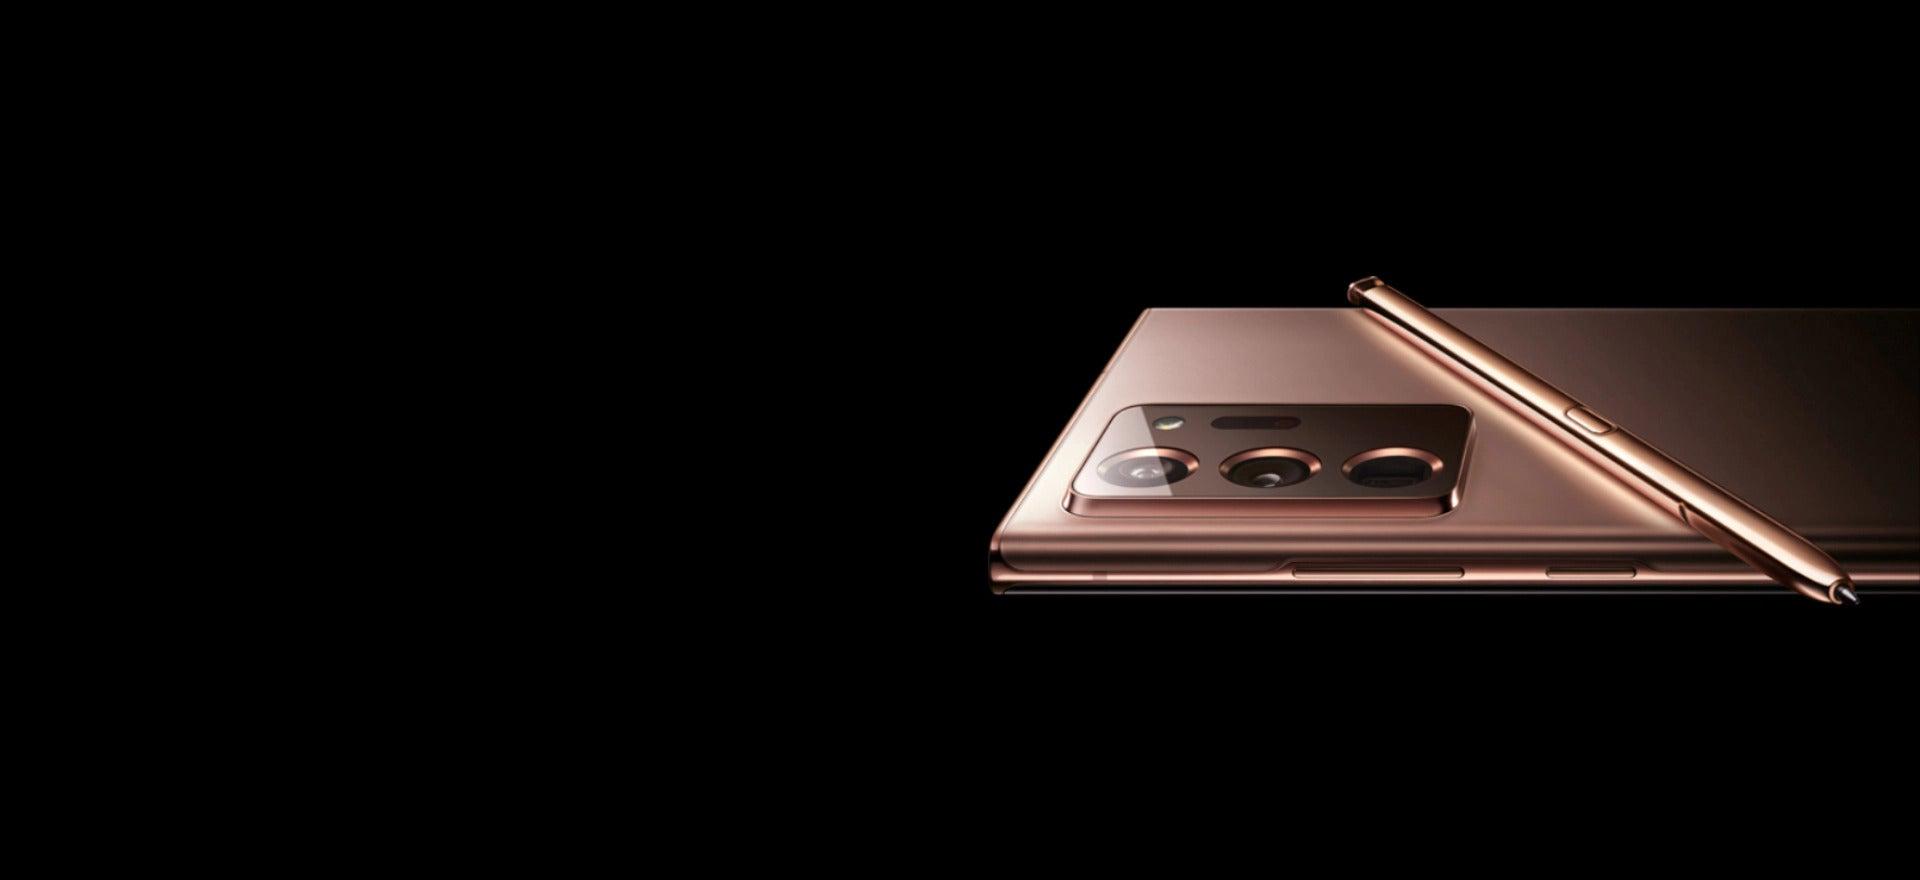 Galaxy Note 20 mystic bronze